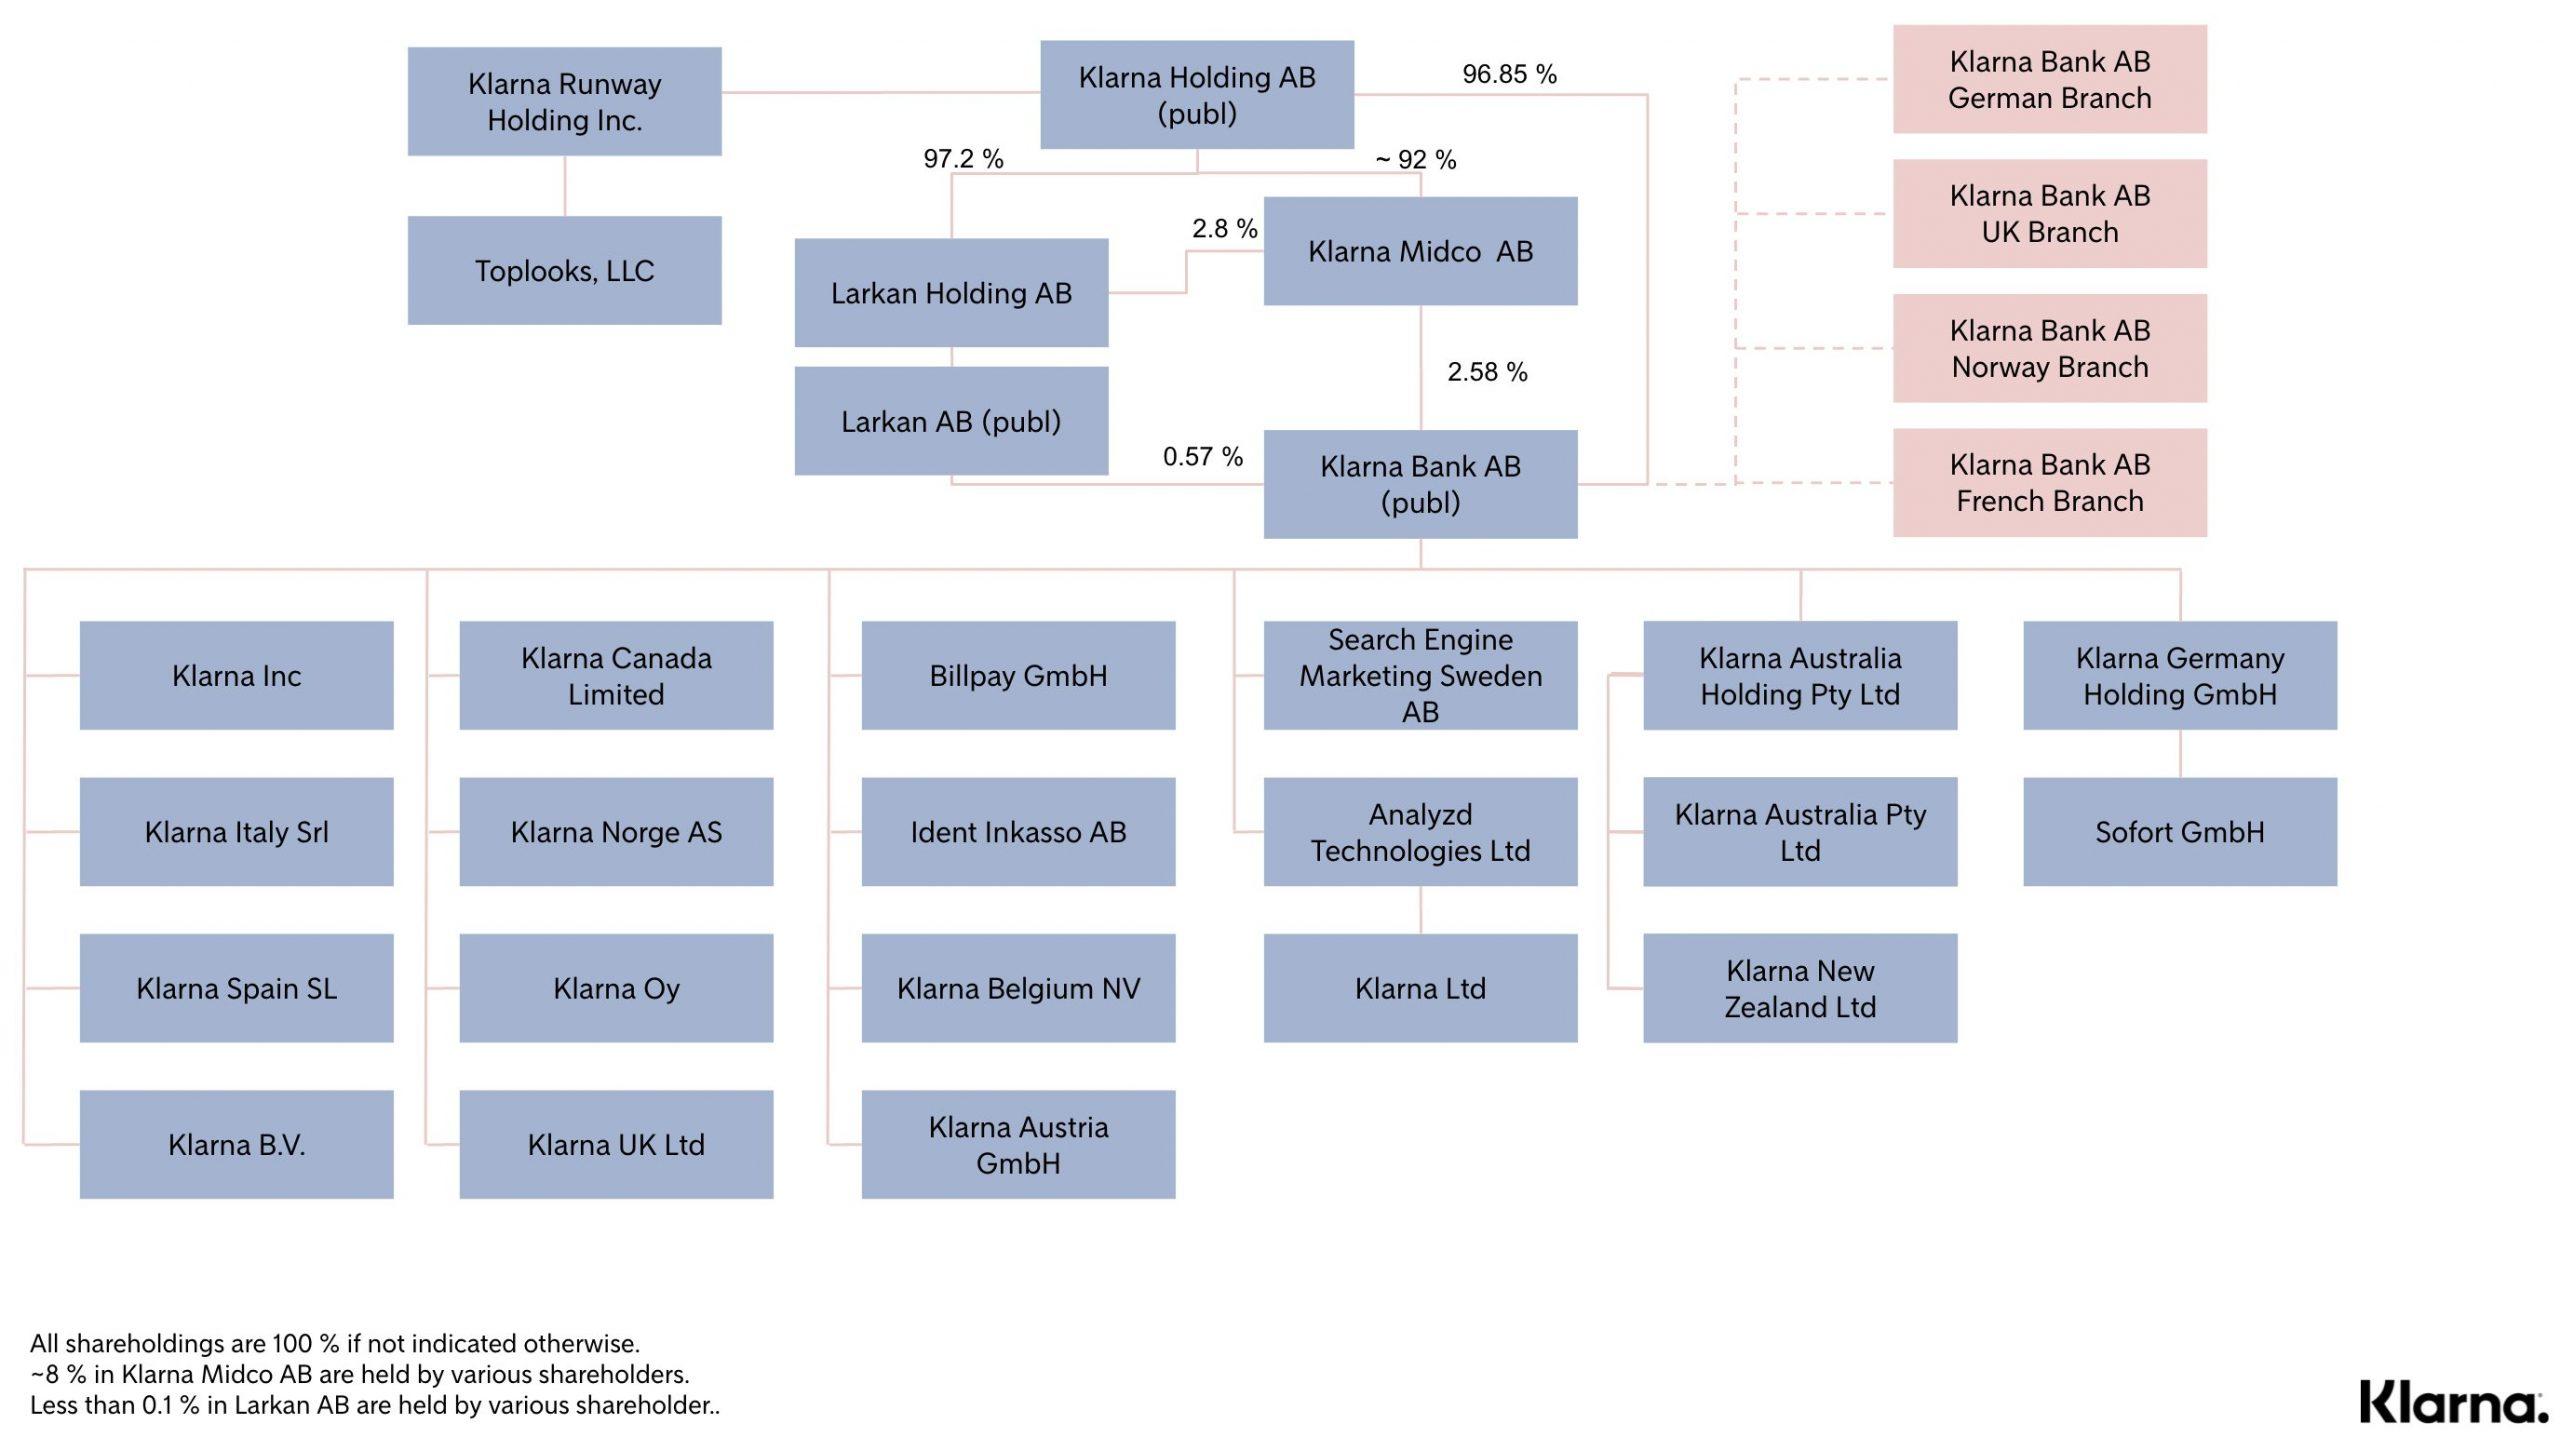 Klarna Legal Entity Chart - May 2021